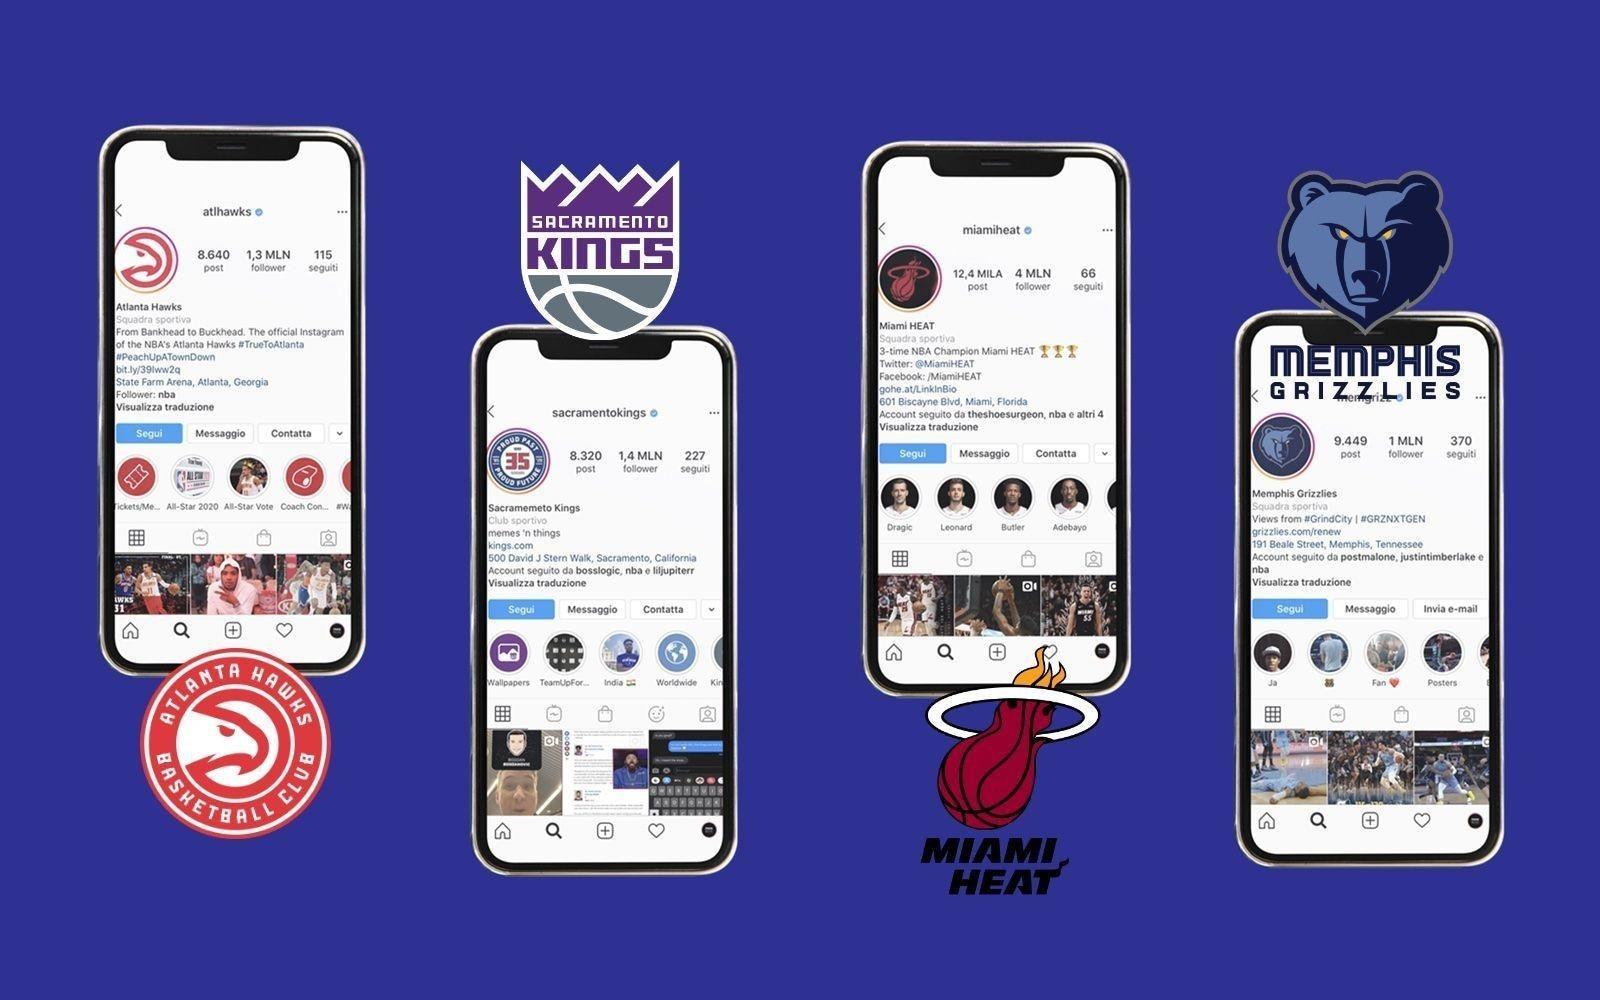 franquicias de la NBA en reels